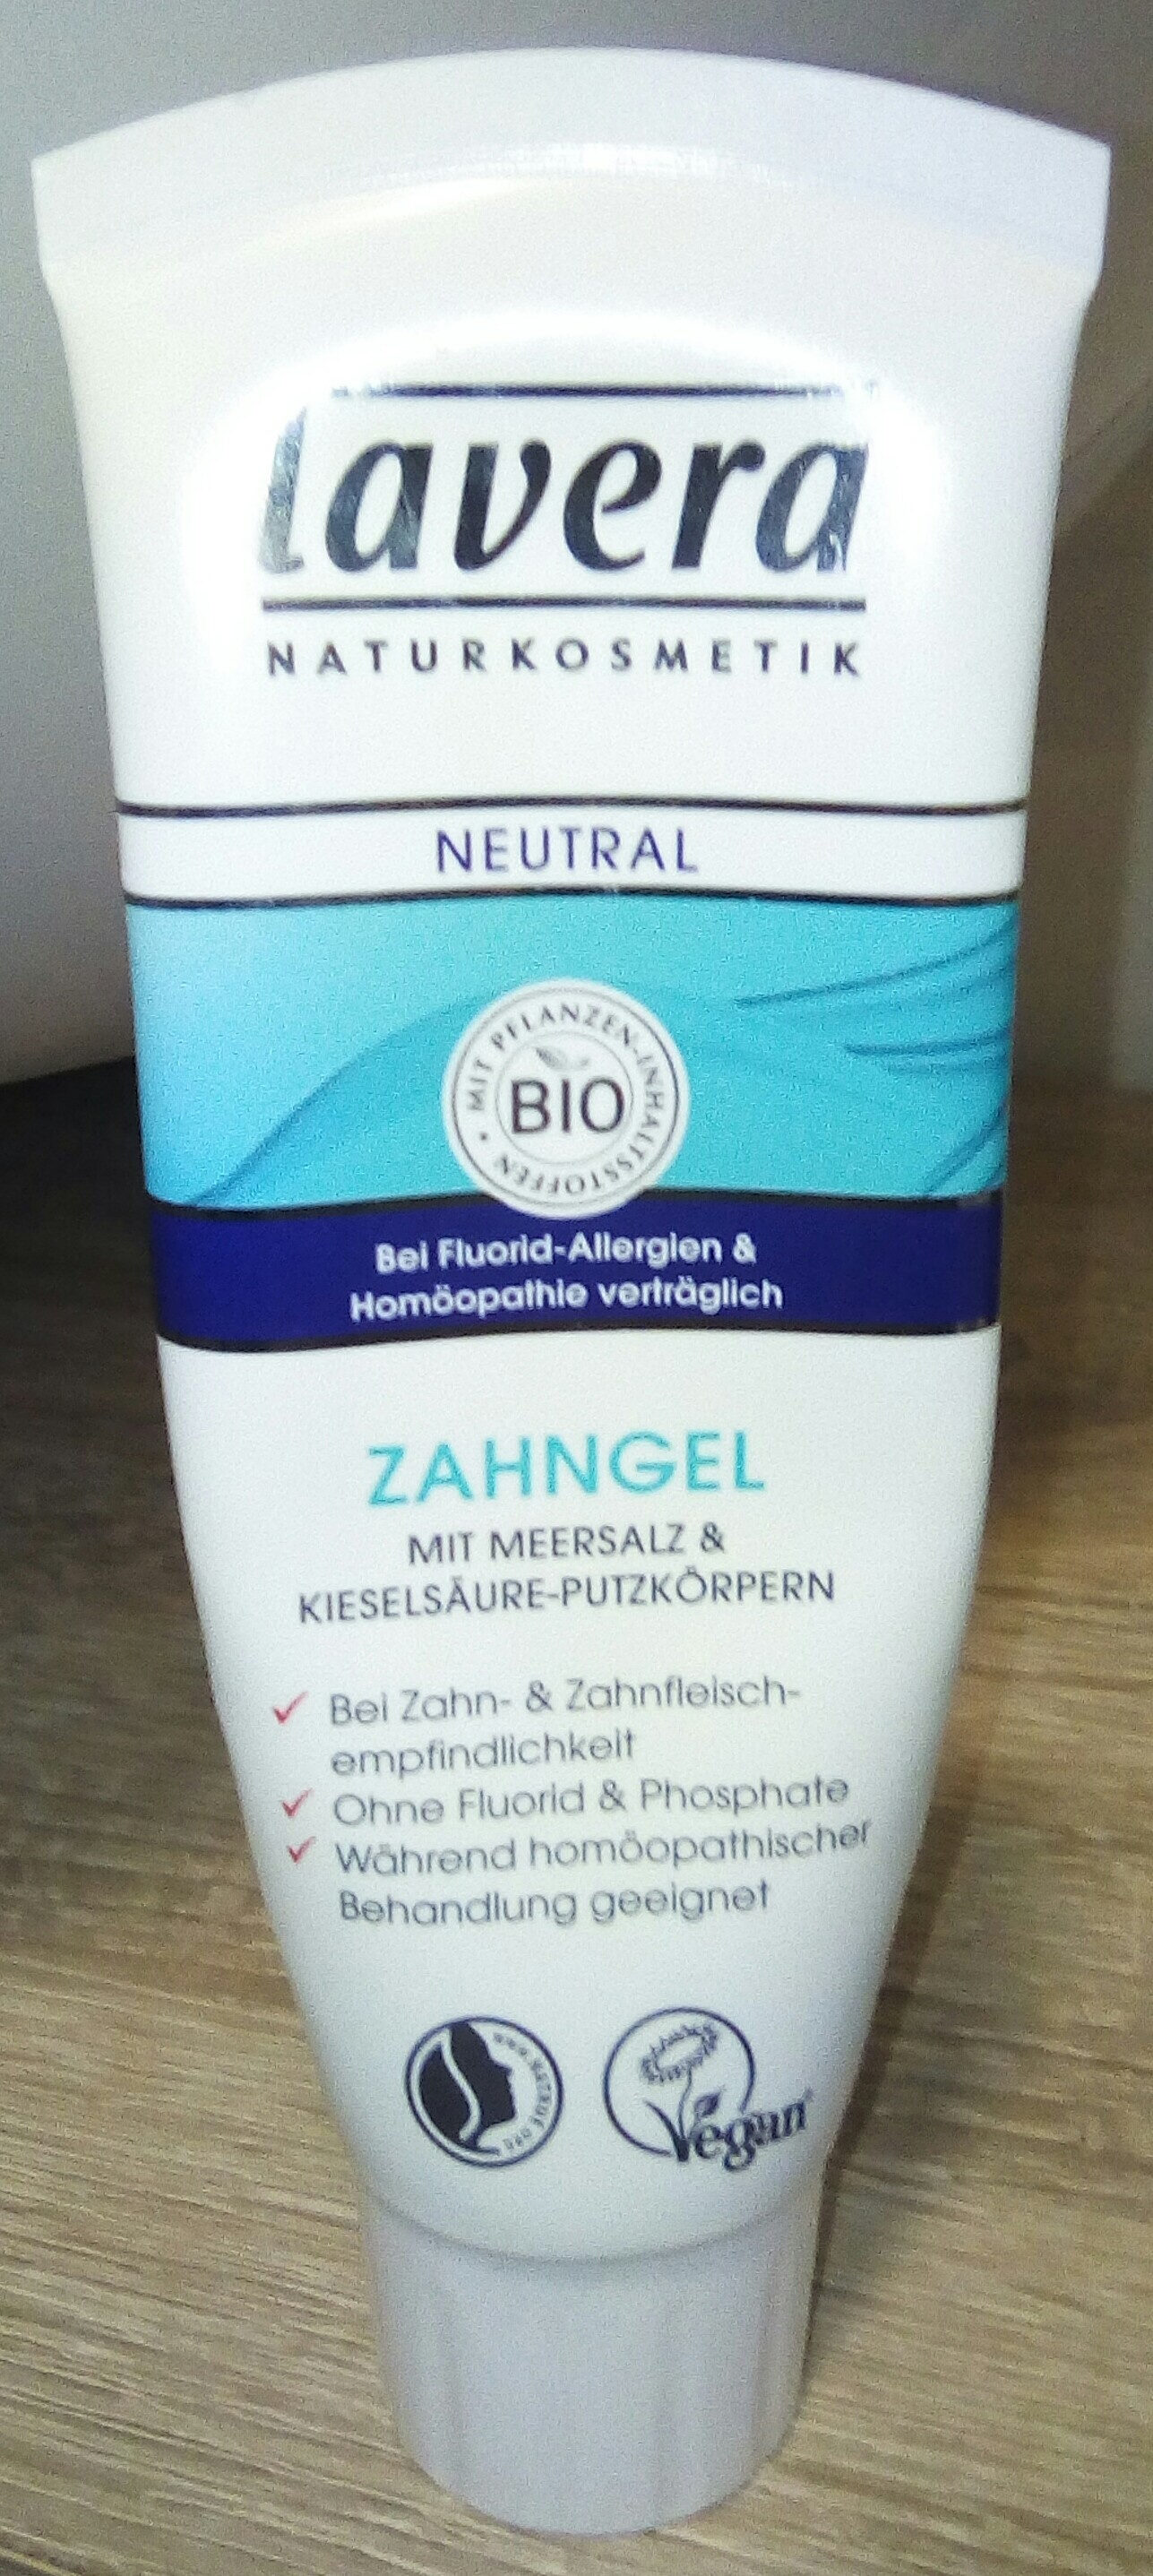 Zahngel - Product